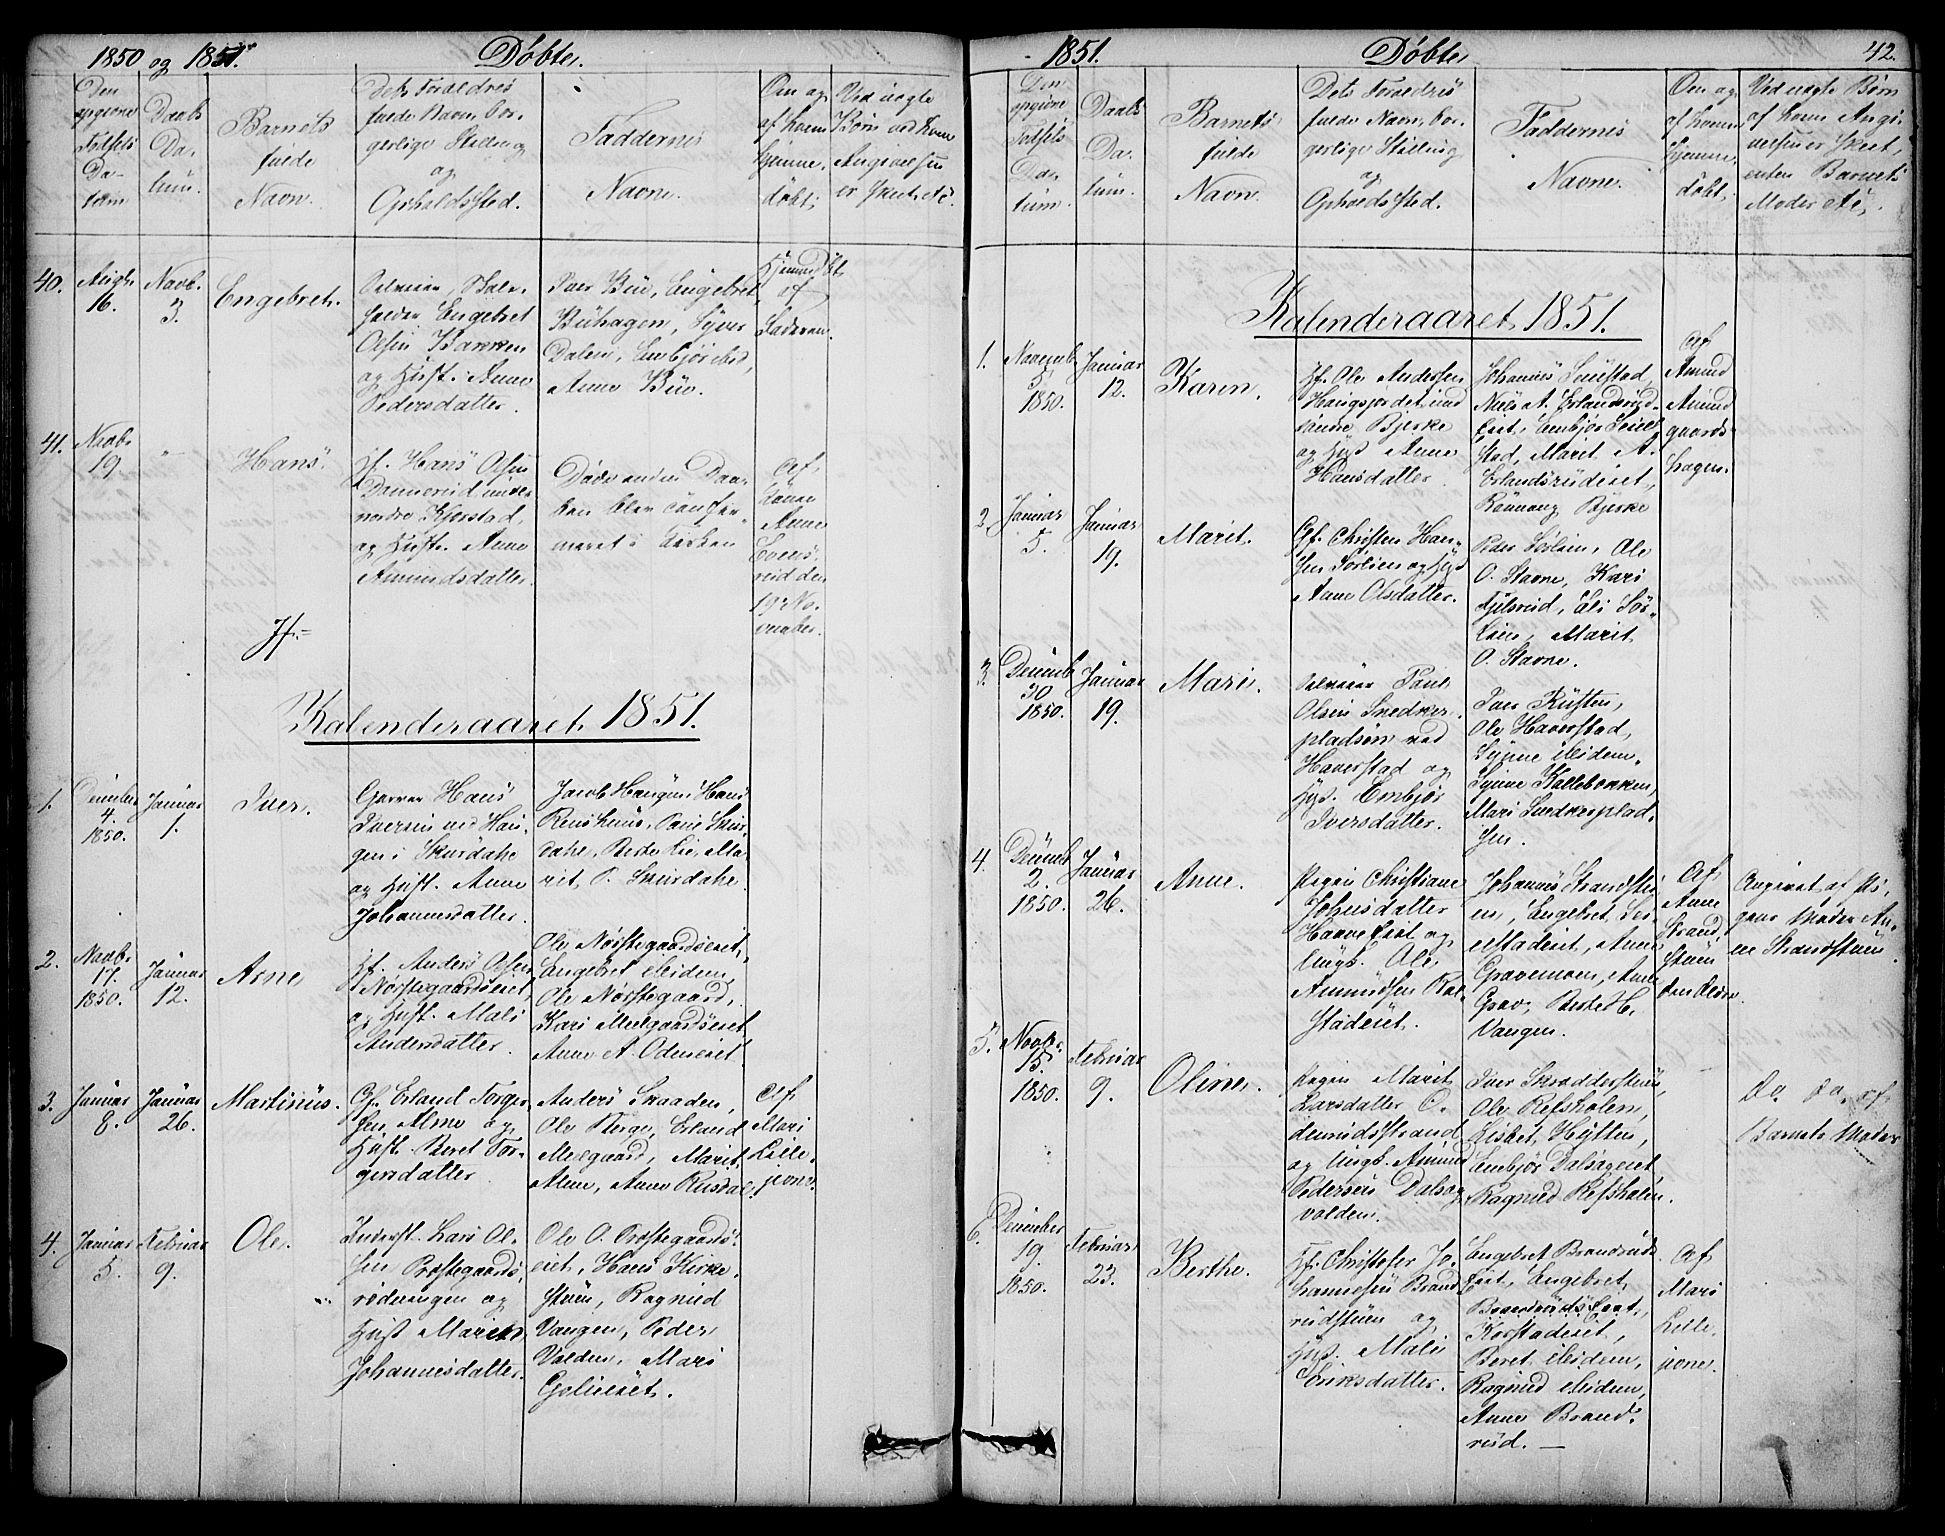 SAH, Sør-Fron prestekontor, H/Ha/Hab/L0001: Klokkerbok nr. 1, 1844-1863, s. 42